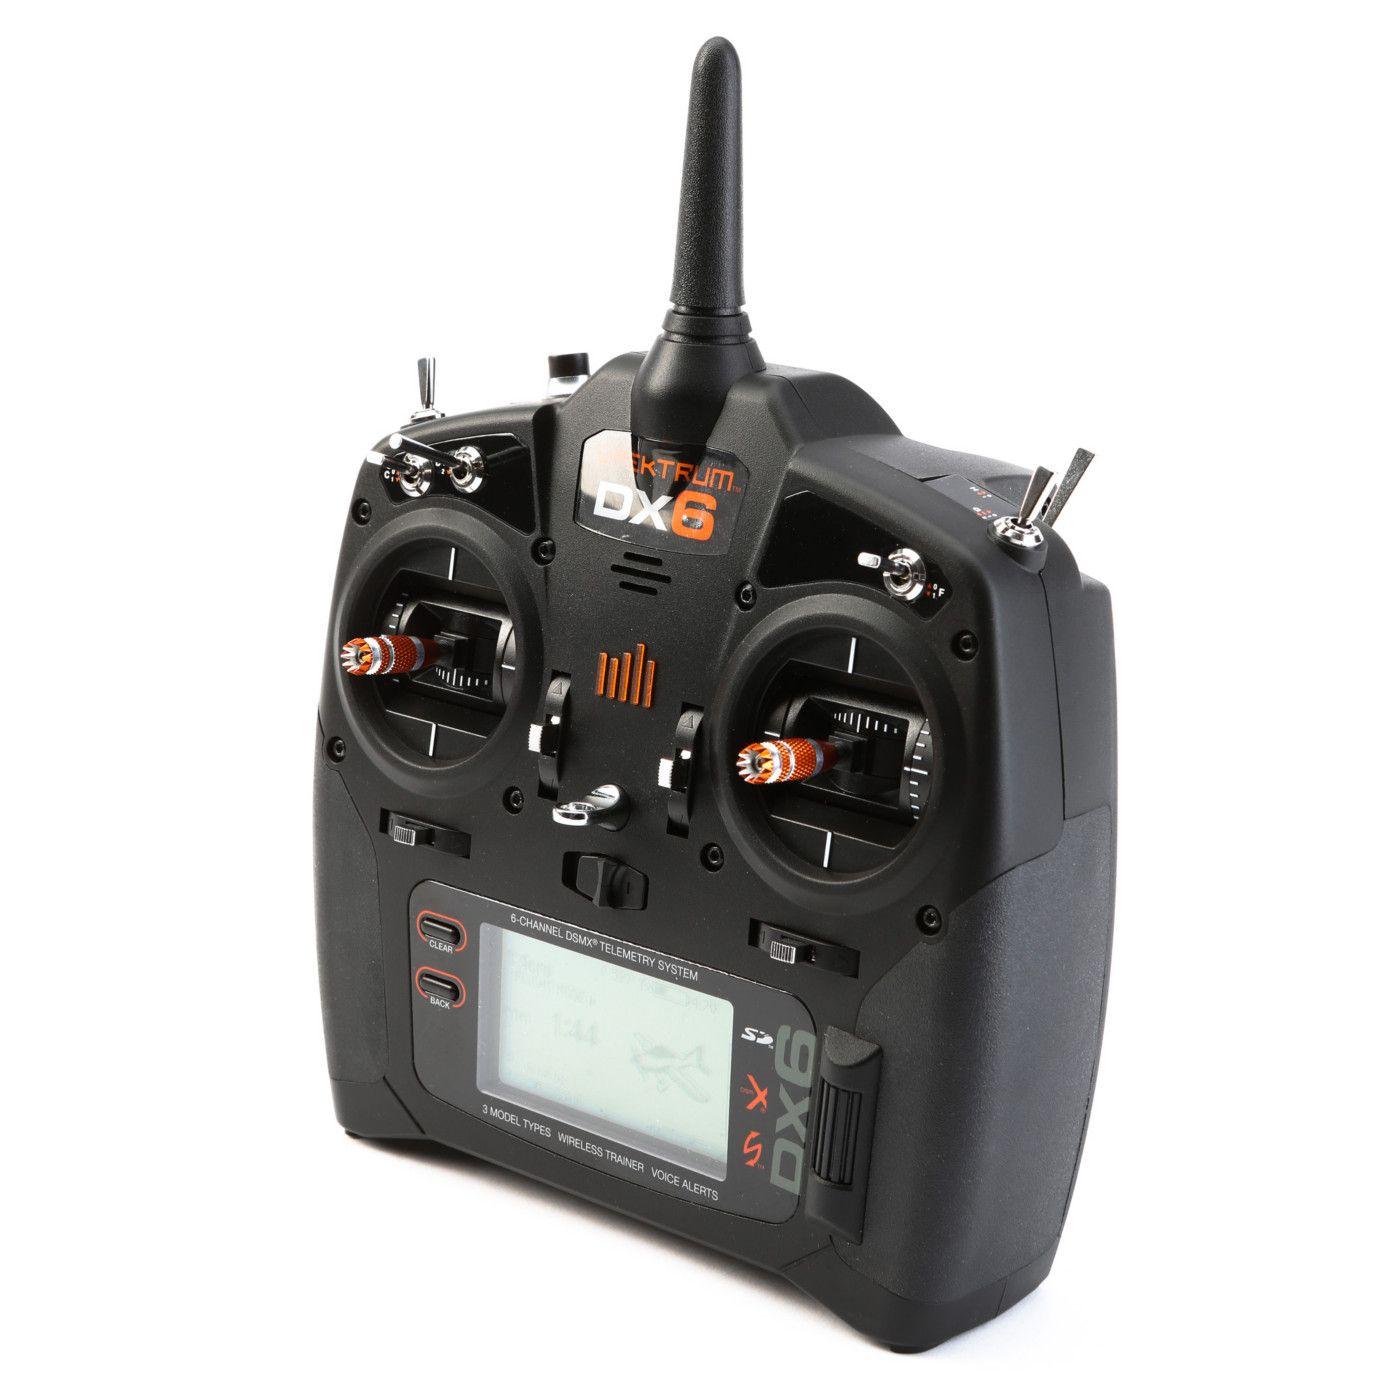 spektrum dx6 6 channel dsmx programmable rc radio transmitter for Spektrum DX5e image for dx6 6 channel dsmx transmitter gen 2 with ar610 receiver, mode 2